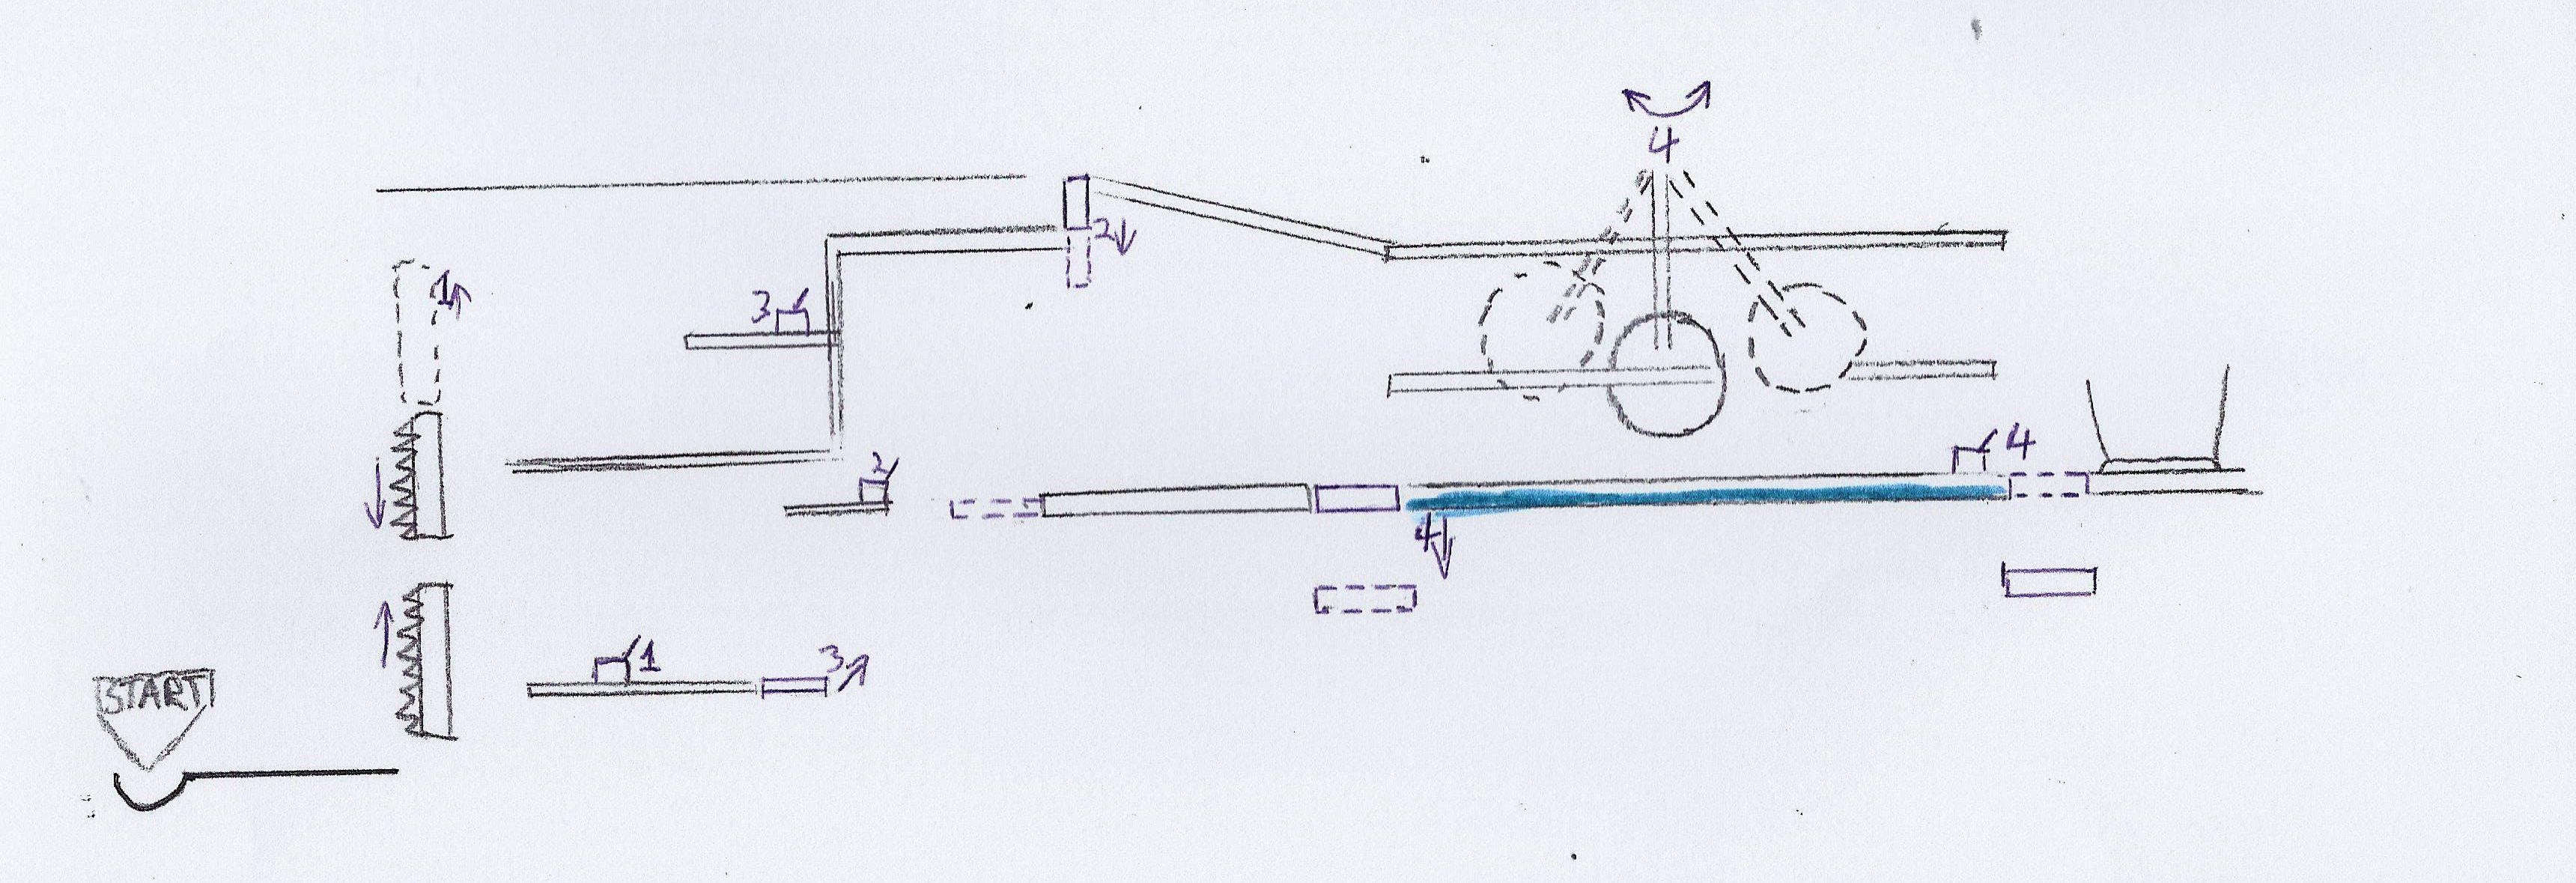 Catapult And Pendulum Image Robot Misfits Indie Db Diagram Add Media Report Rss View Original